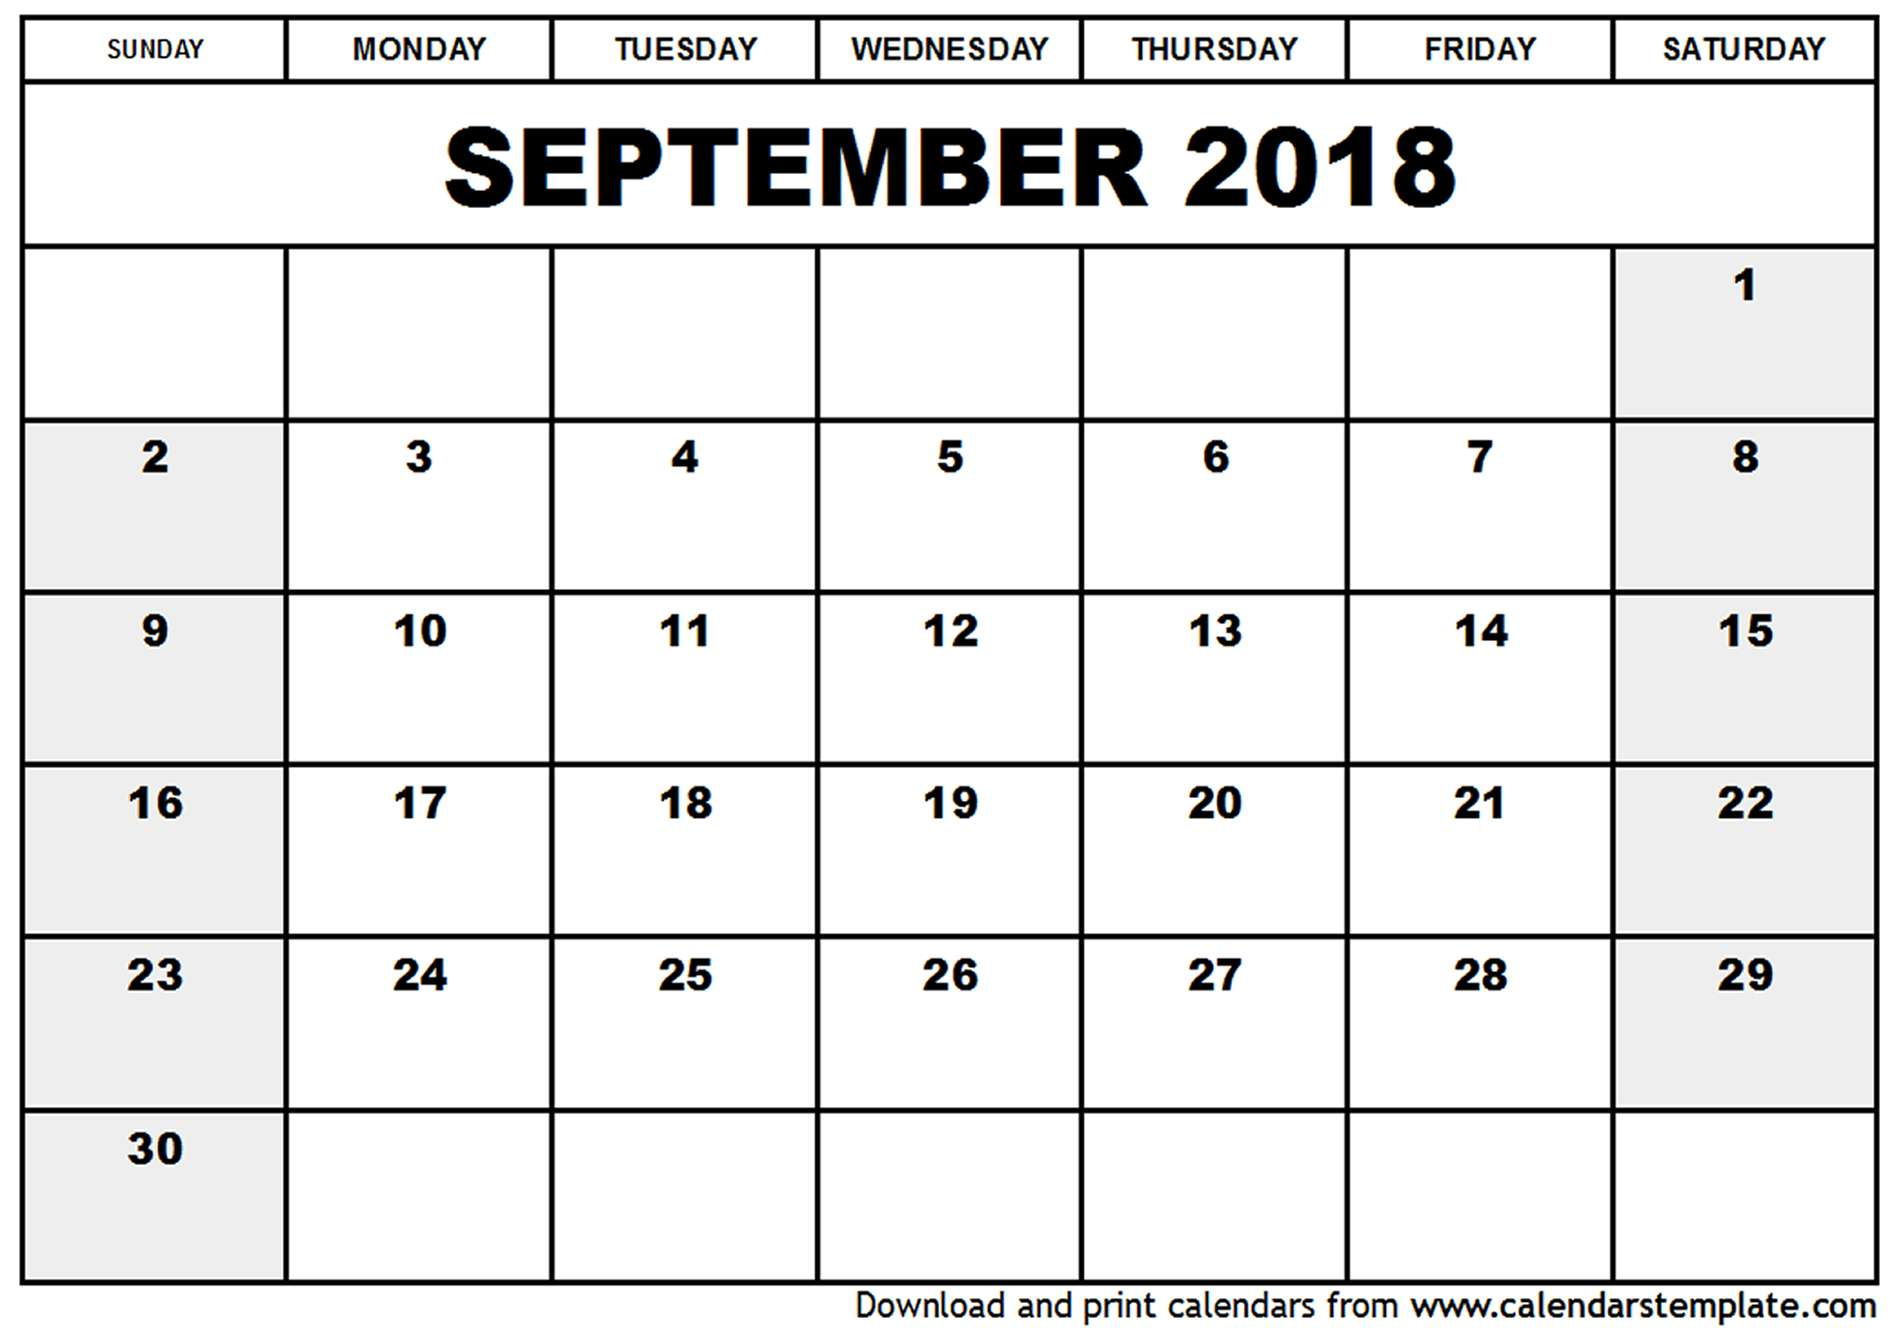 September 2018 Printable Calendar | 2018 calendar printable